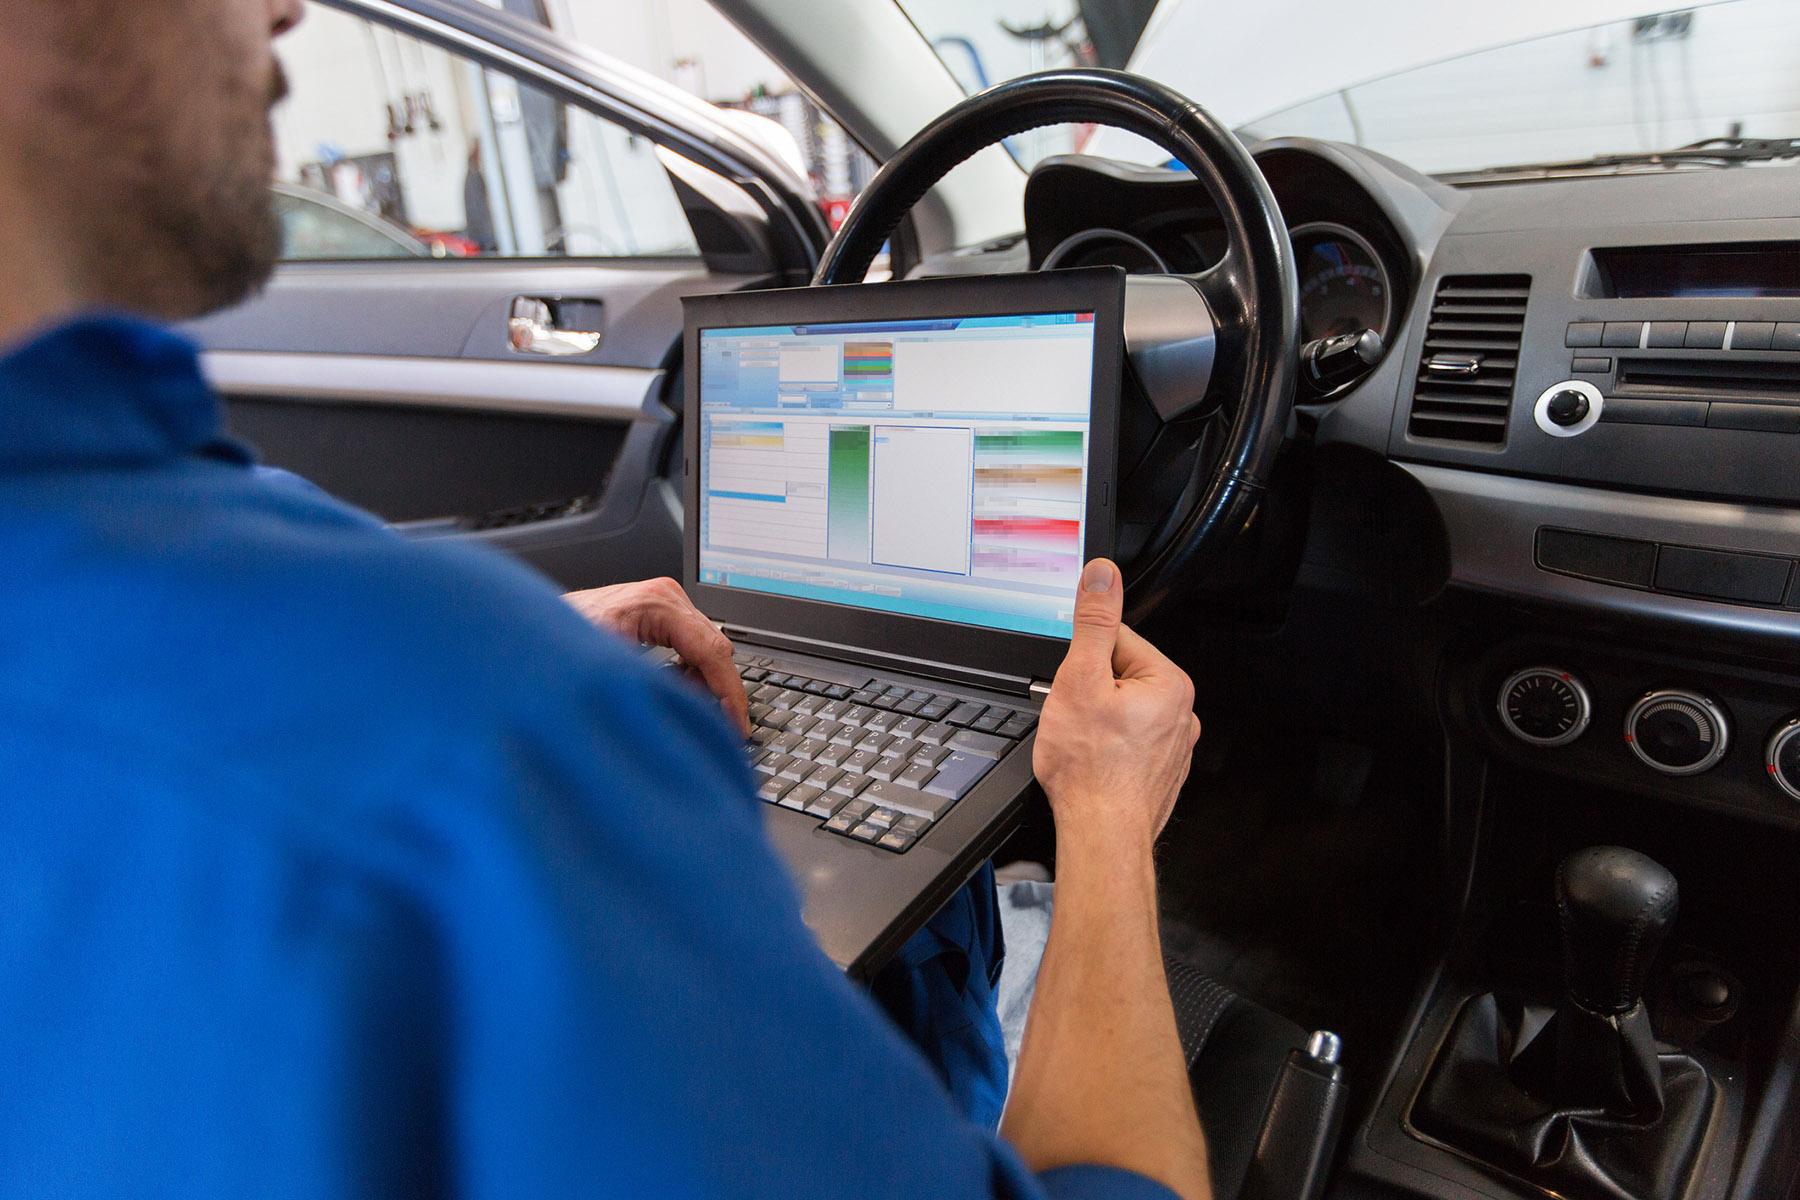 Car Repairs | Car Mechanics | Service Garage | MOT Servicing | Tyre Replacement | Brake Repair | Middlesbrough | TS Auto Repairs